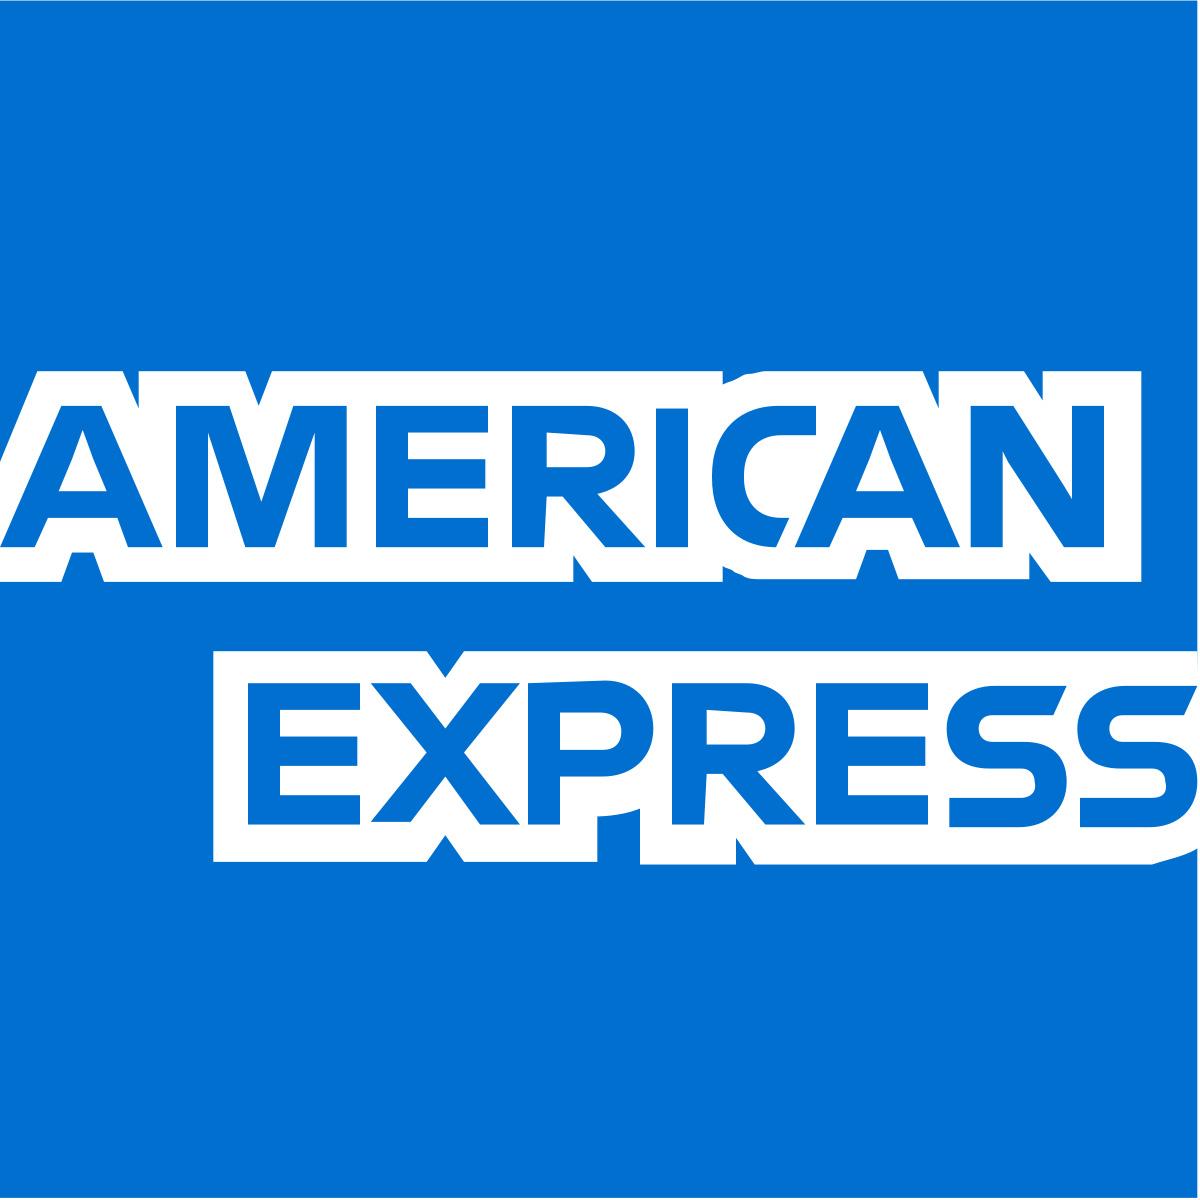 americanexpress_logo-copy.jpg